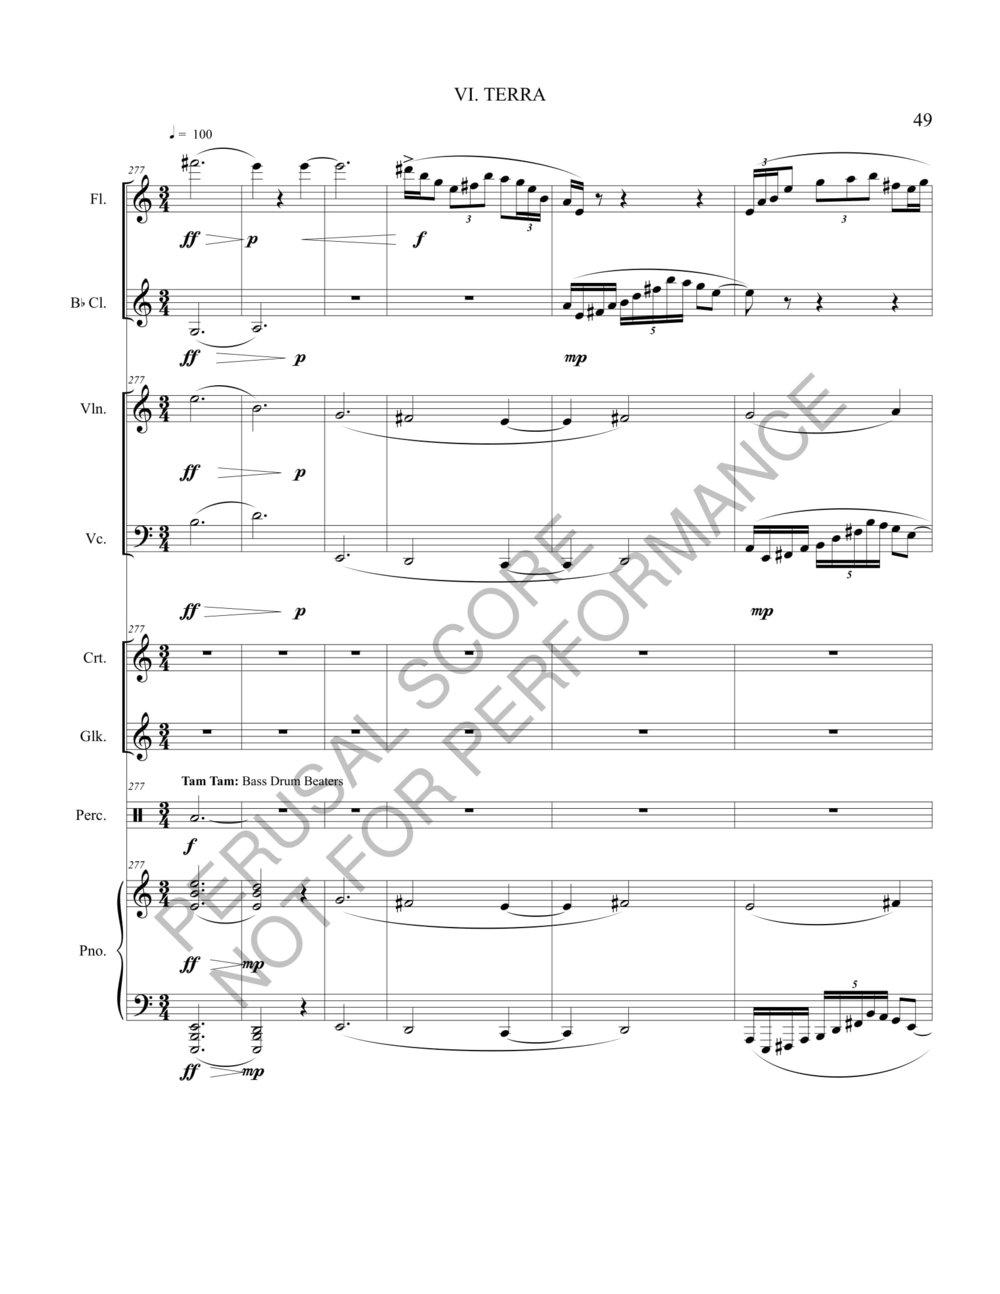 Boyd Terra Liberi Score-watermark-55.jpg